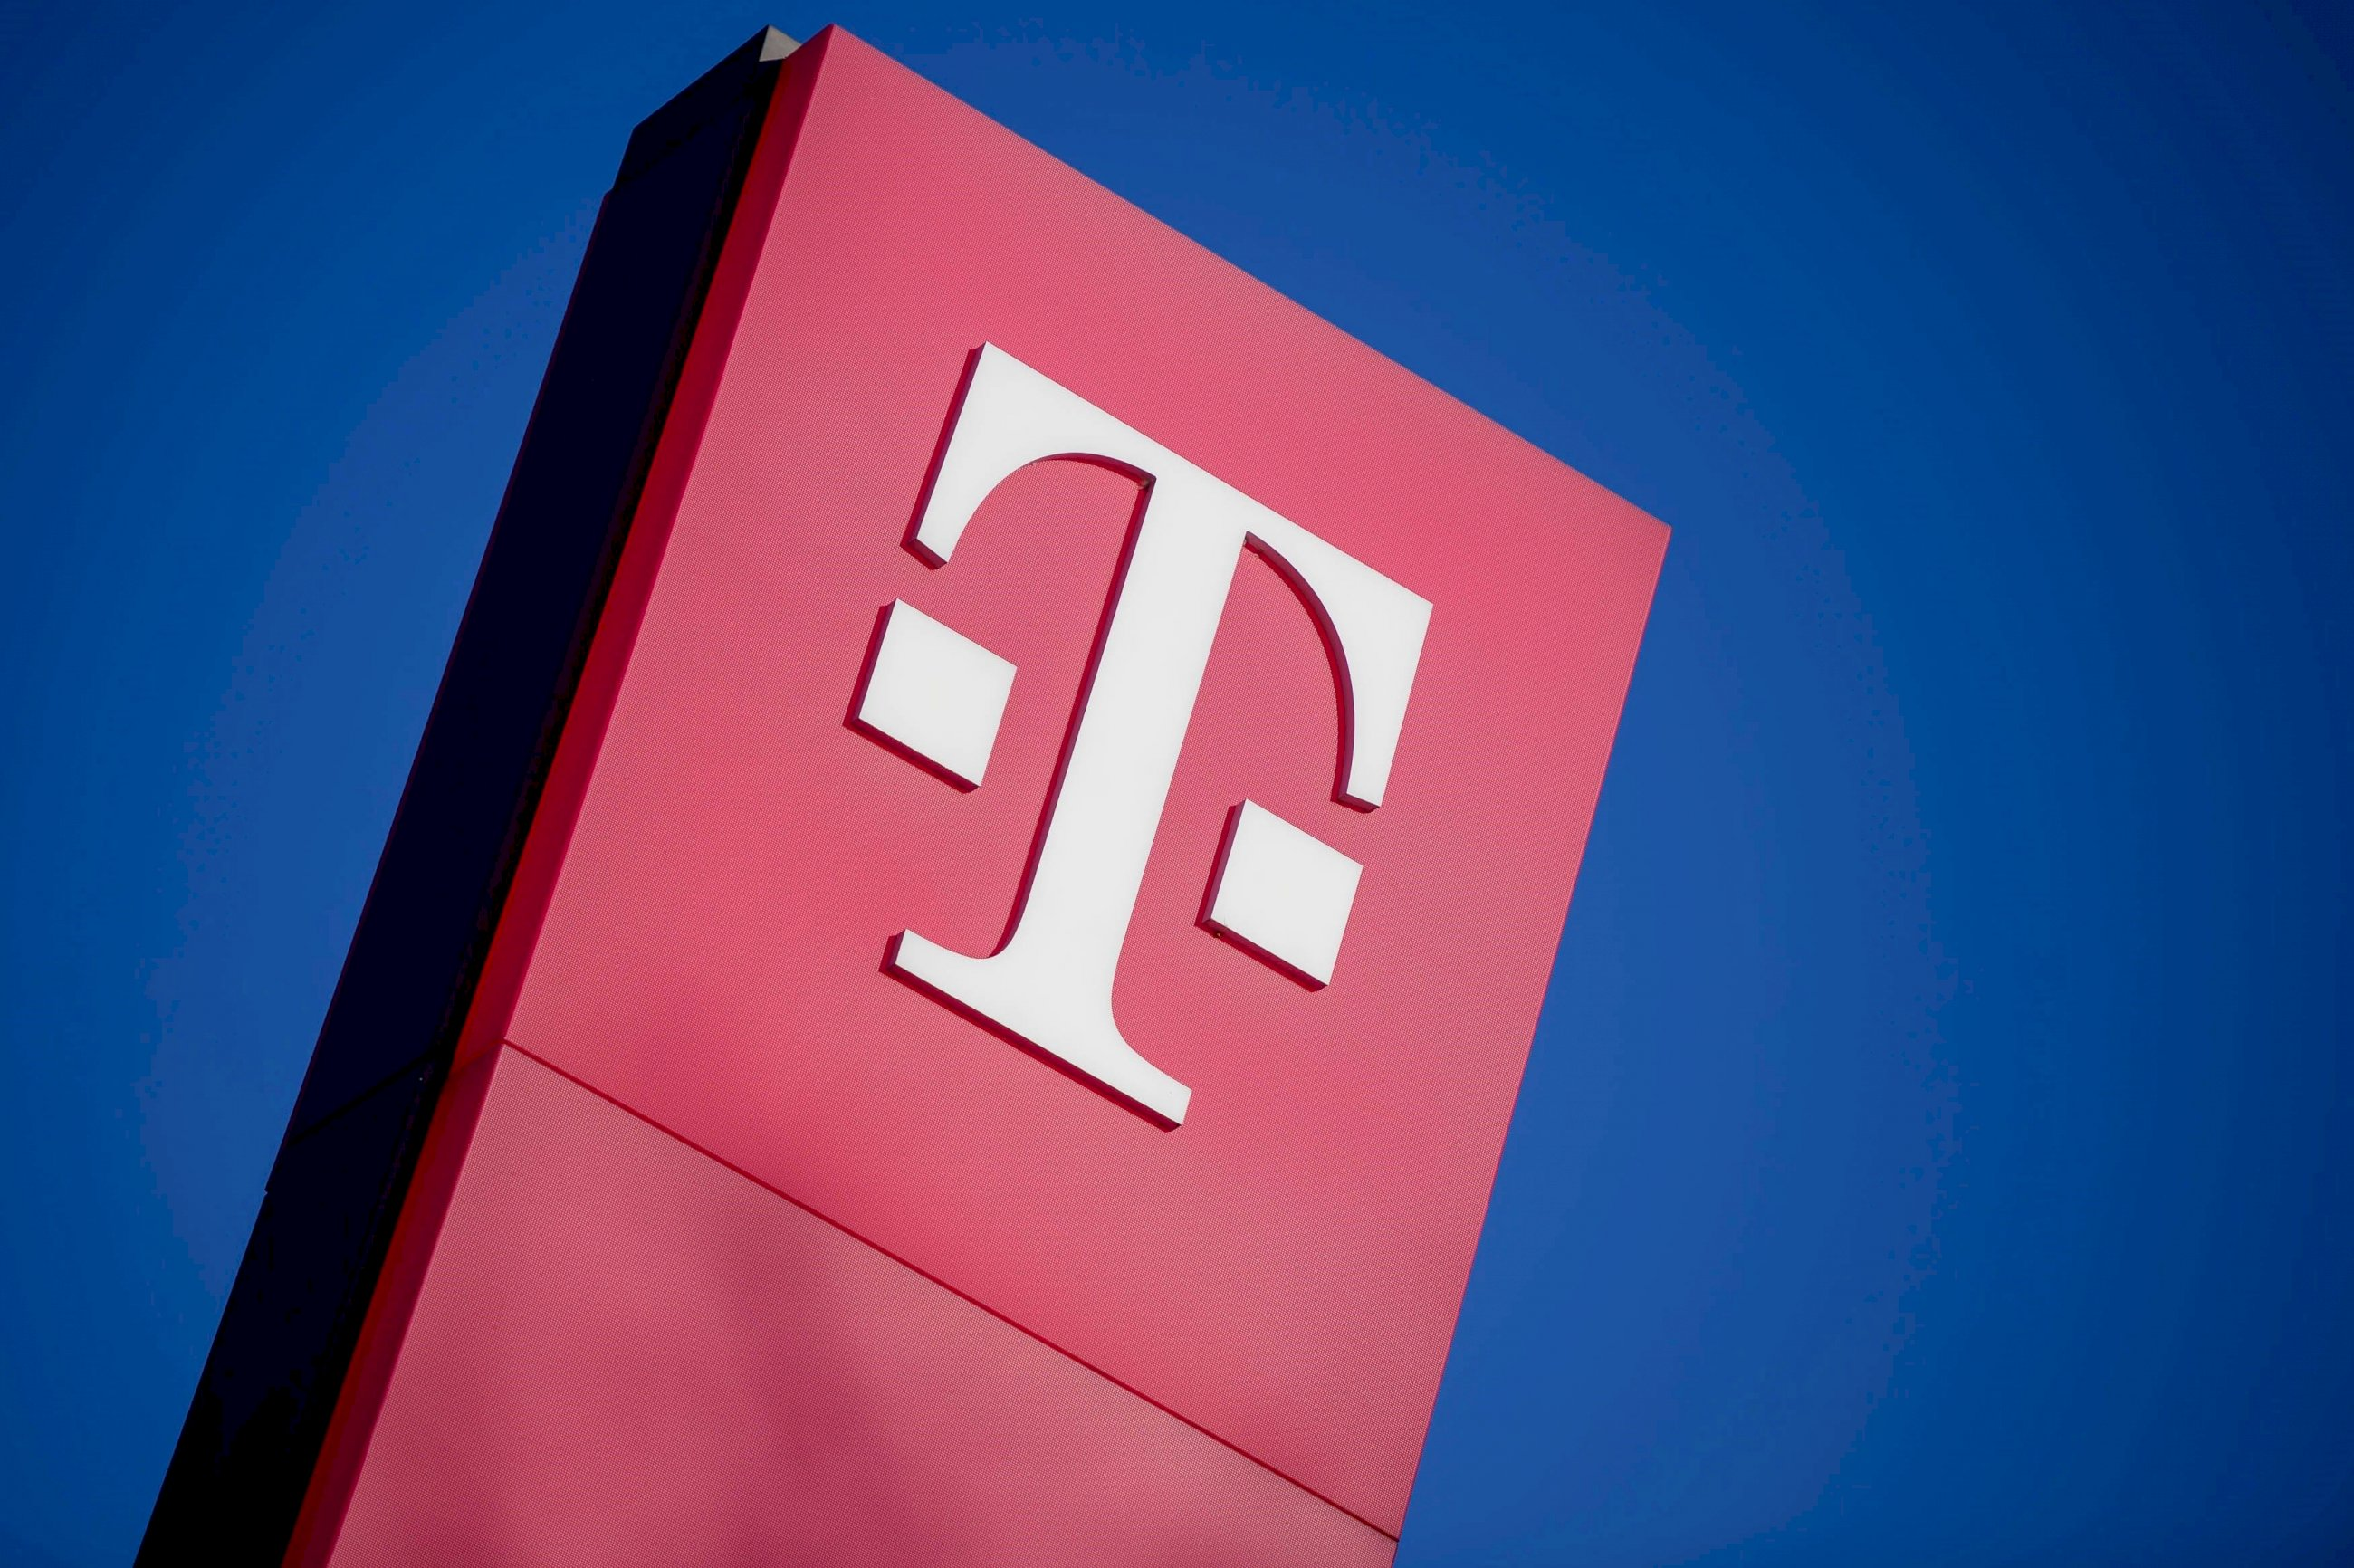 La sede de Deutsche Telekom en Bonn, Alemania. Foto: EFE/JS